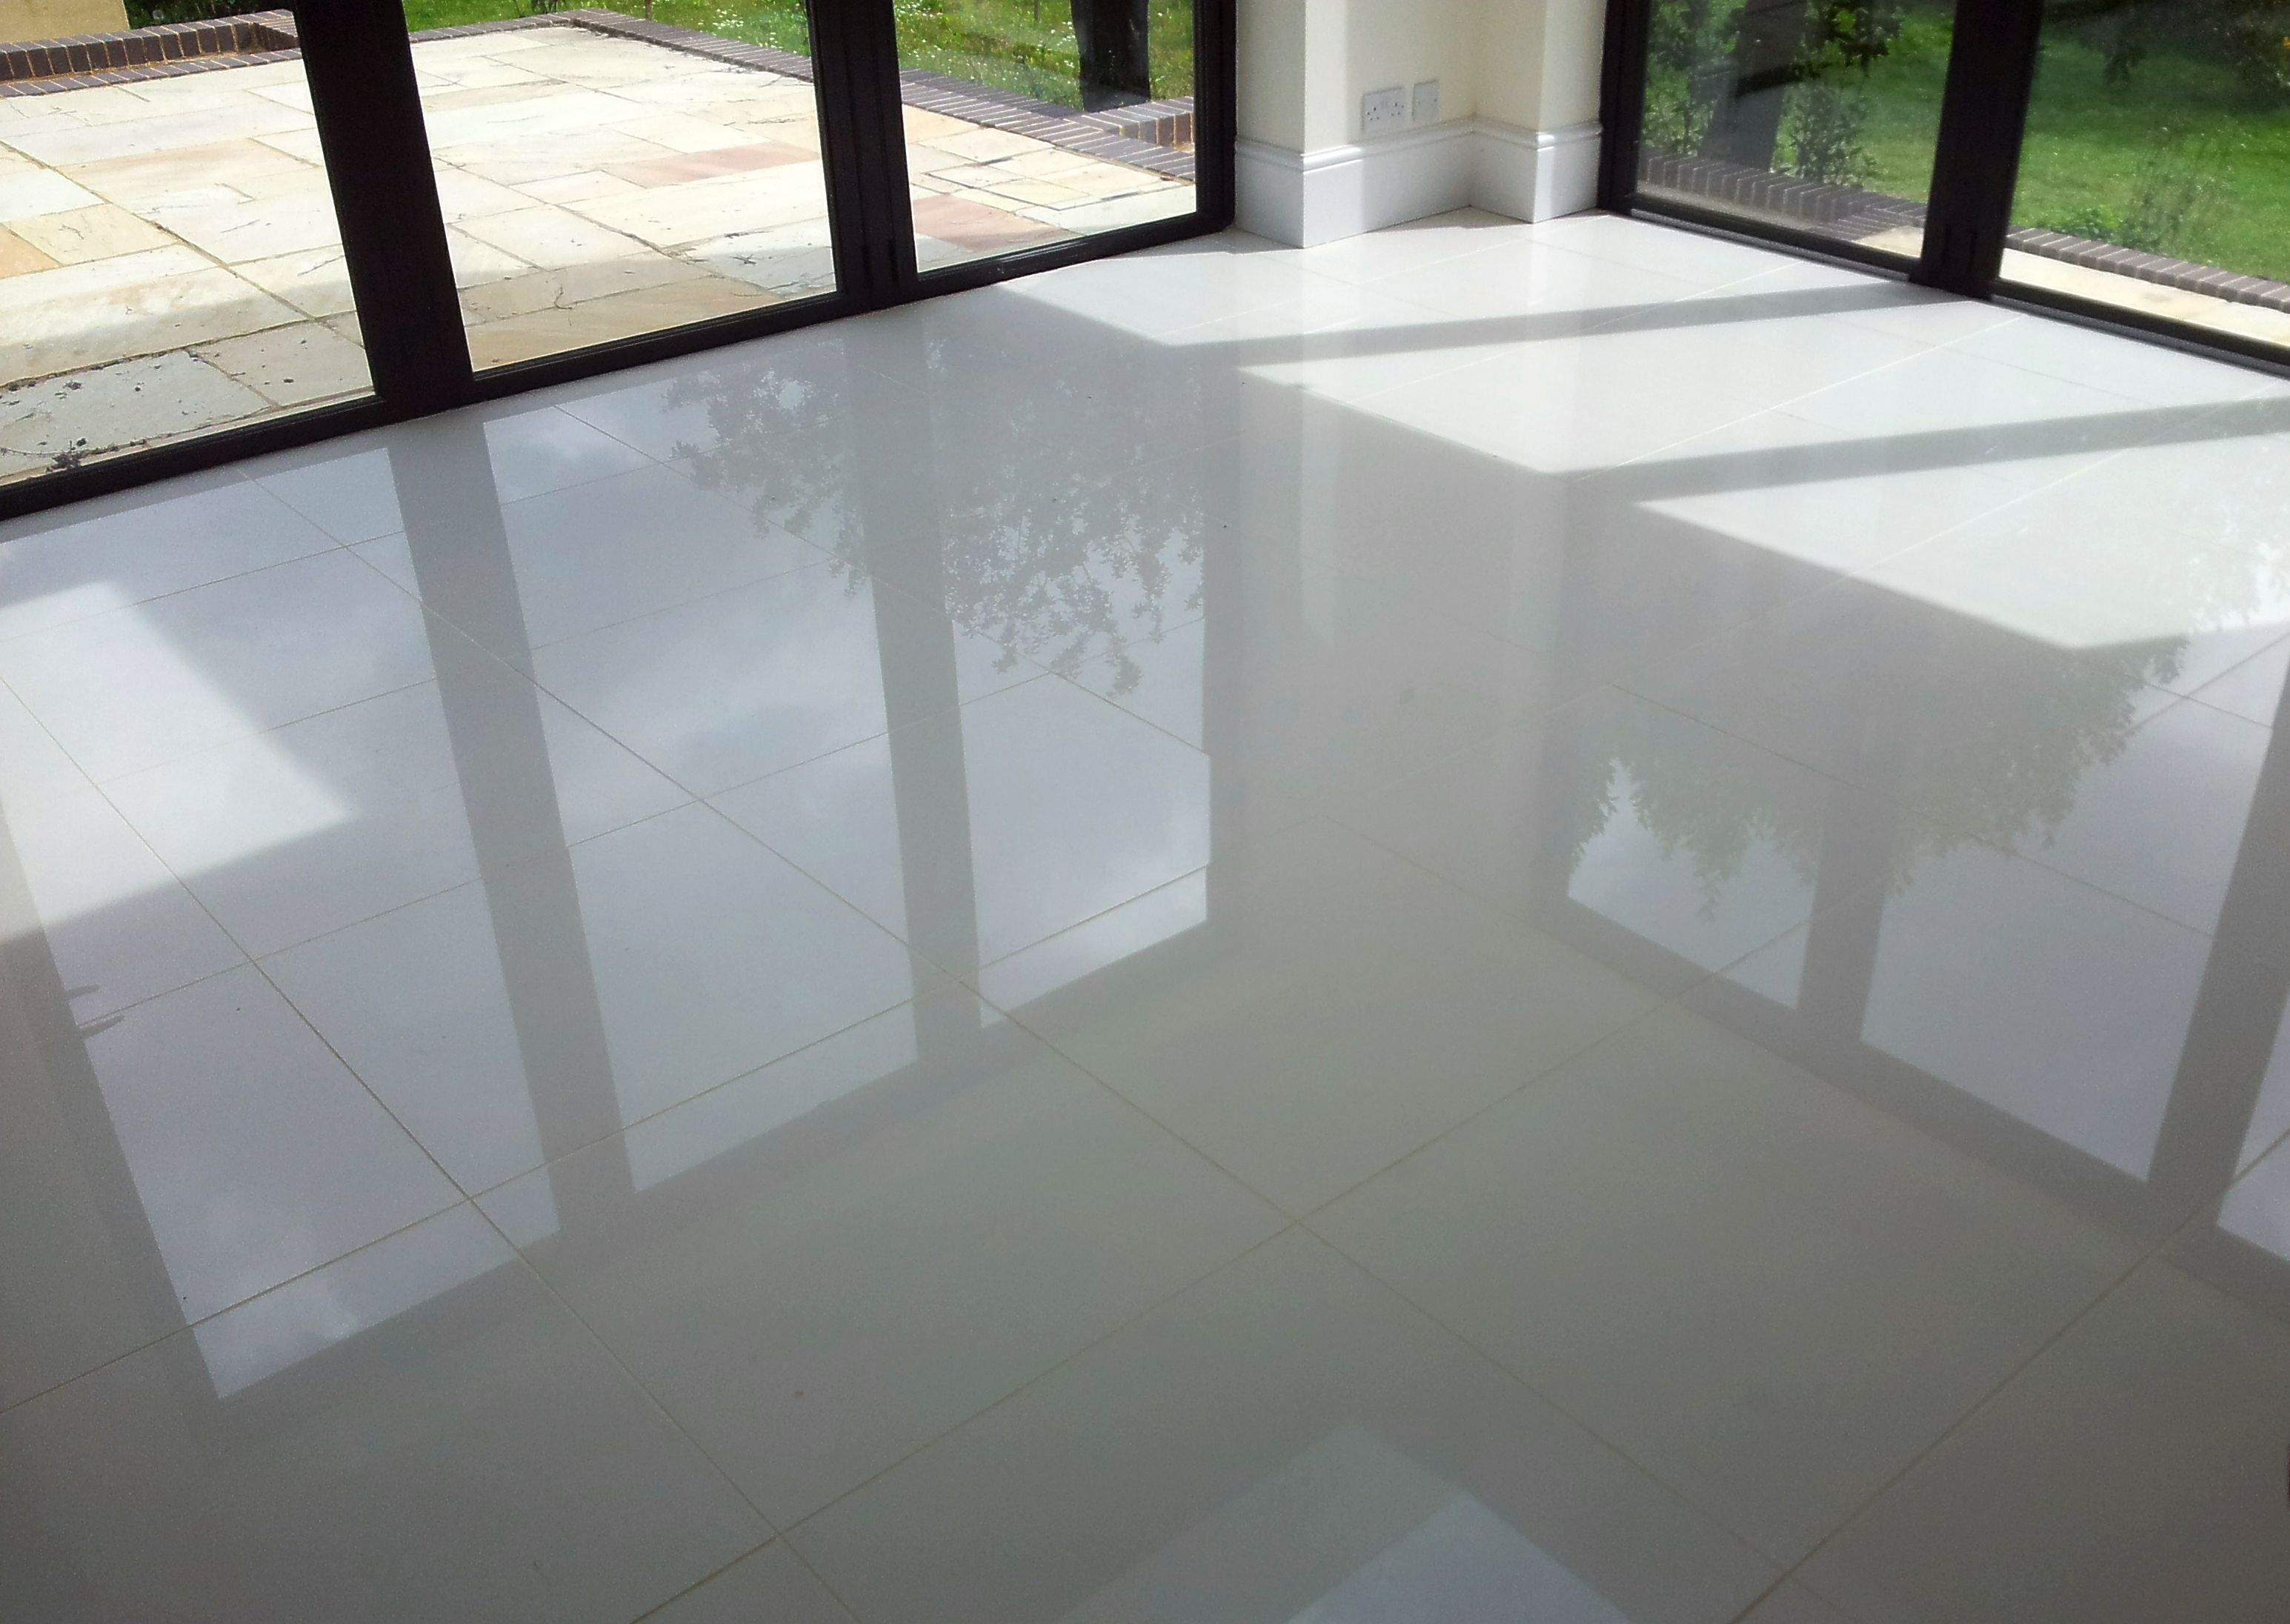 Large shiny floor tiles httpnextsoft21 pinterest tile large shiny floor tiles doublecrazyfo Image collections